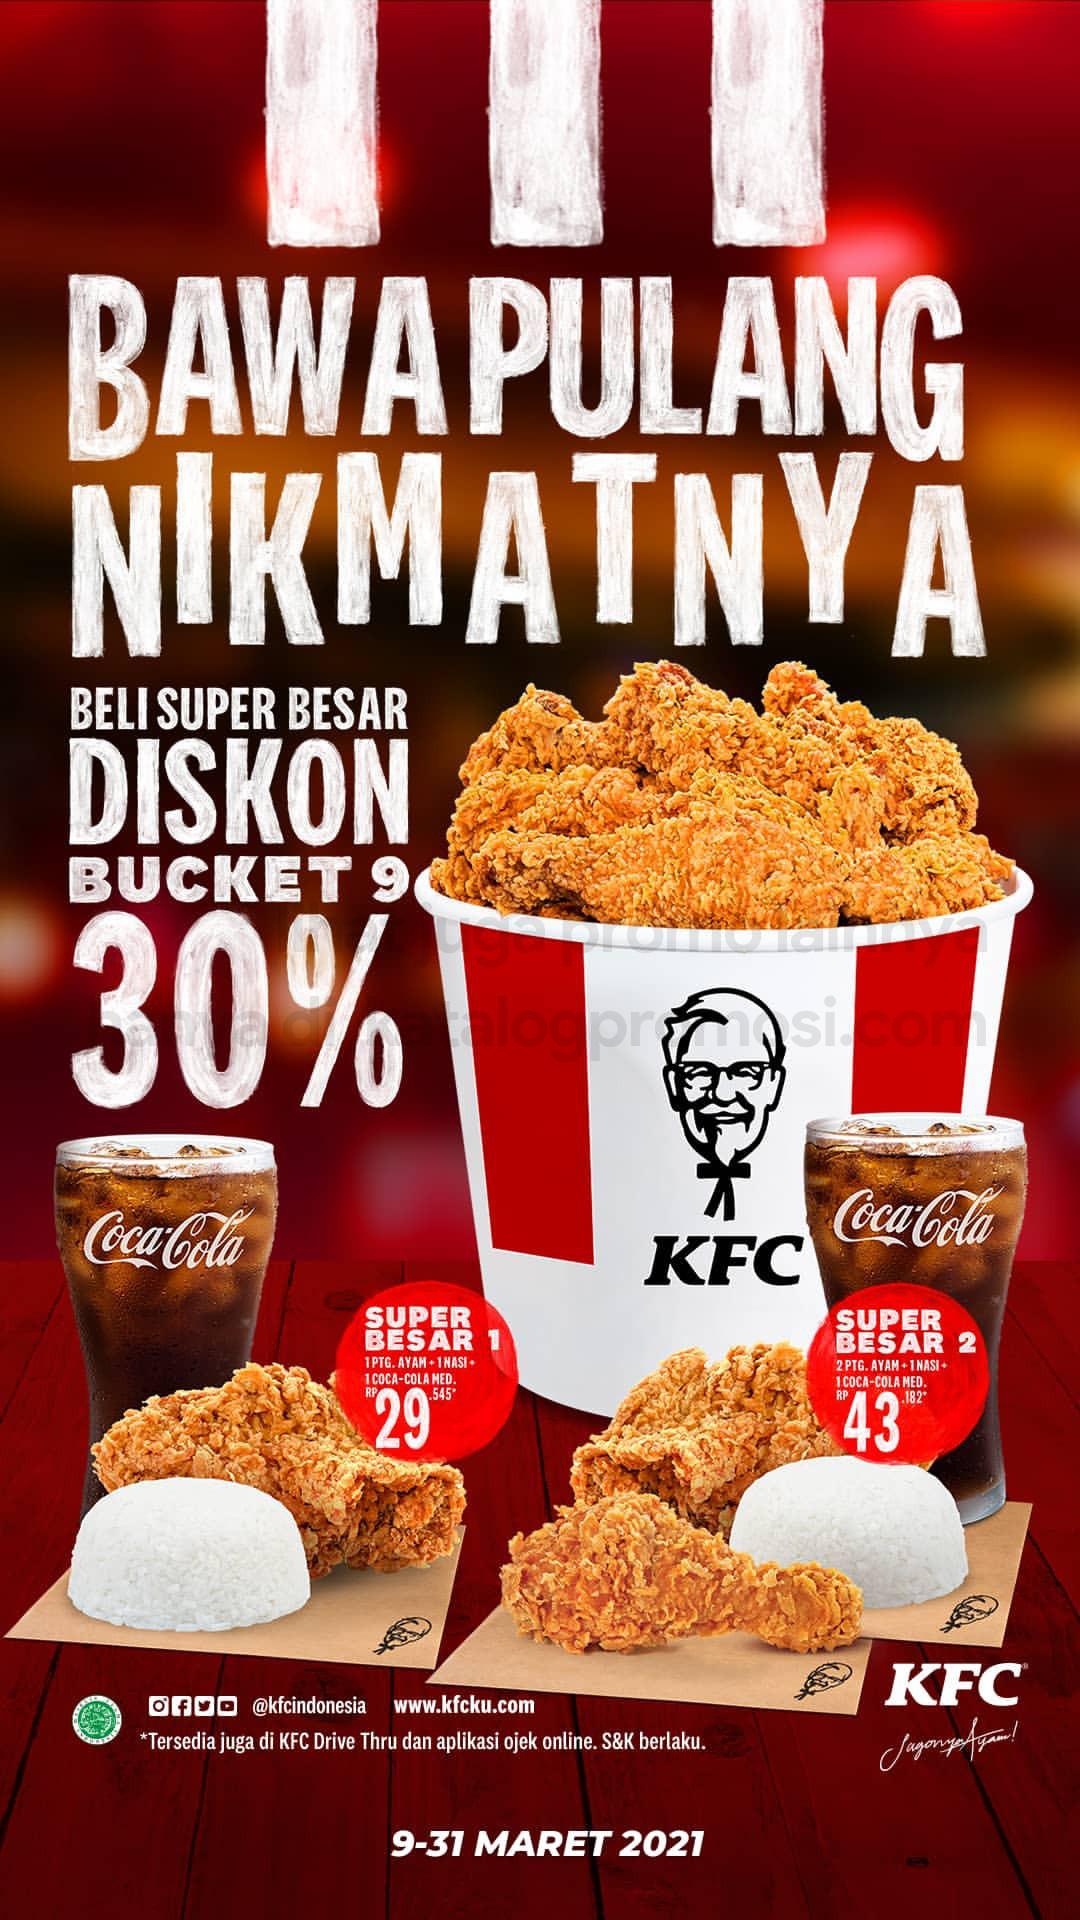 Promo KFC TERBARU - Beli Paket Super Besar DISKON 30% untuk Bucket isi 9pcs